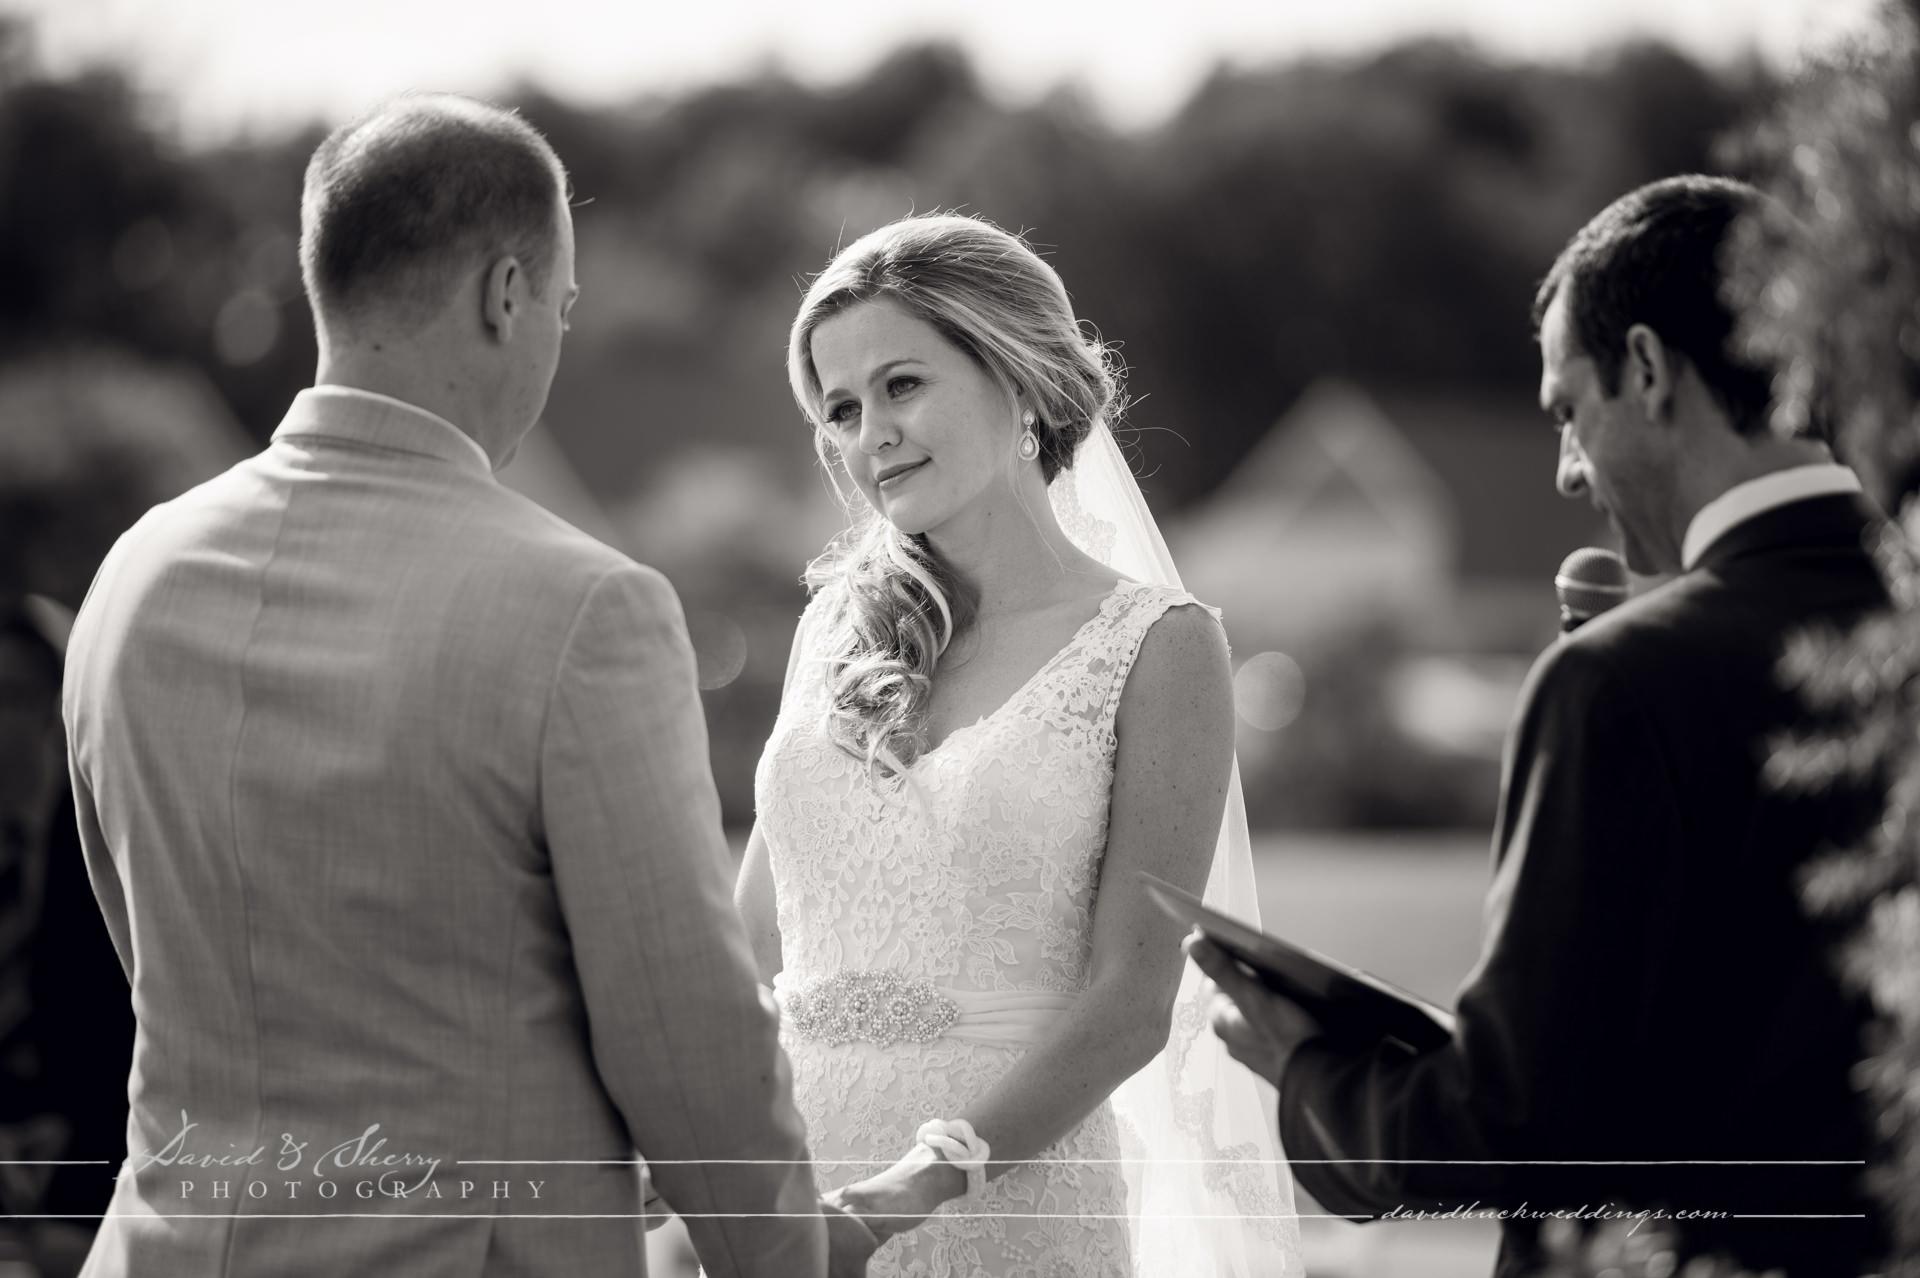 Cobble_Beach_Wedding_Photography_Owen_Sound_25